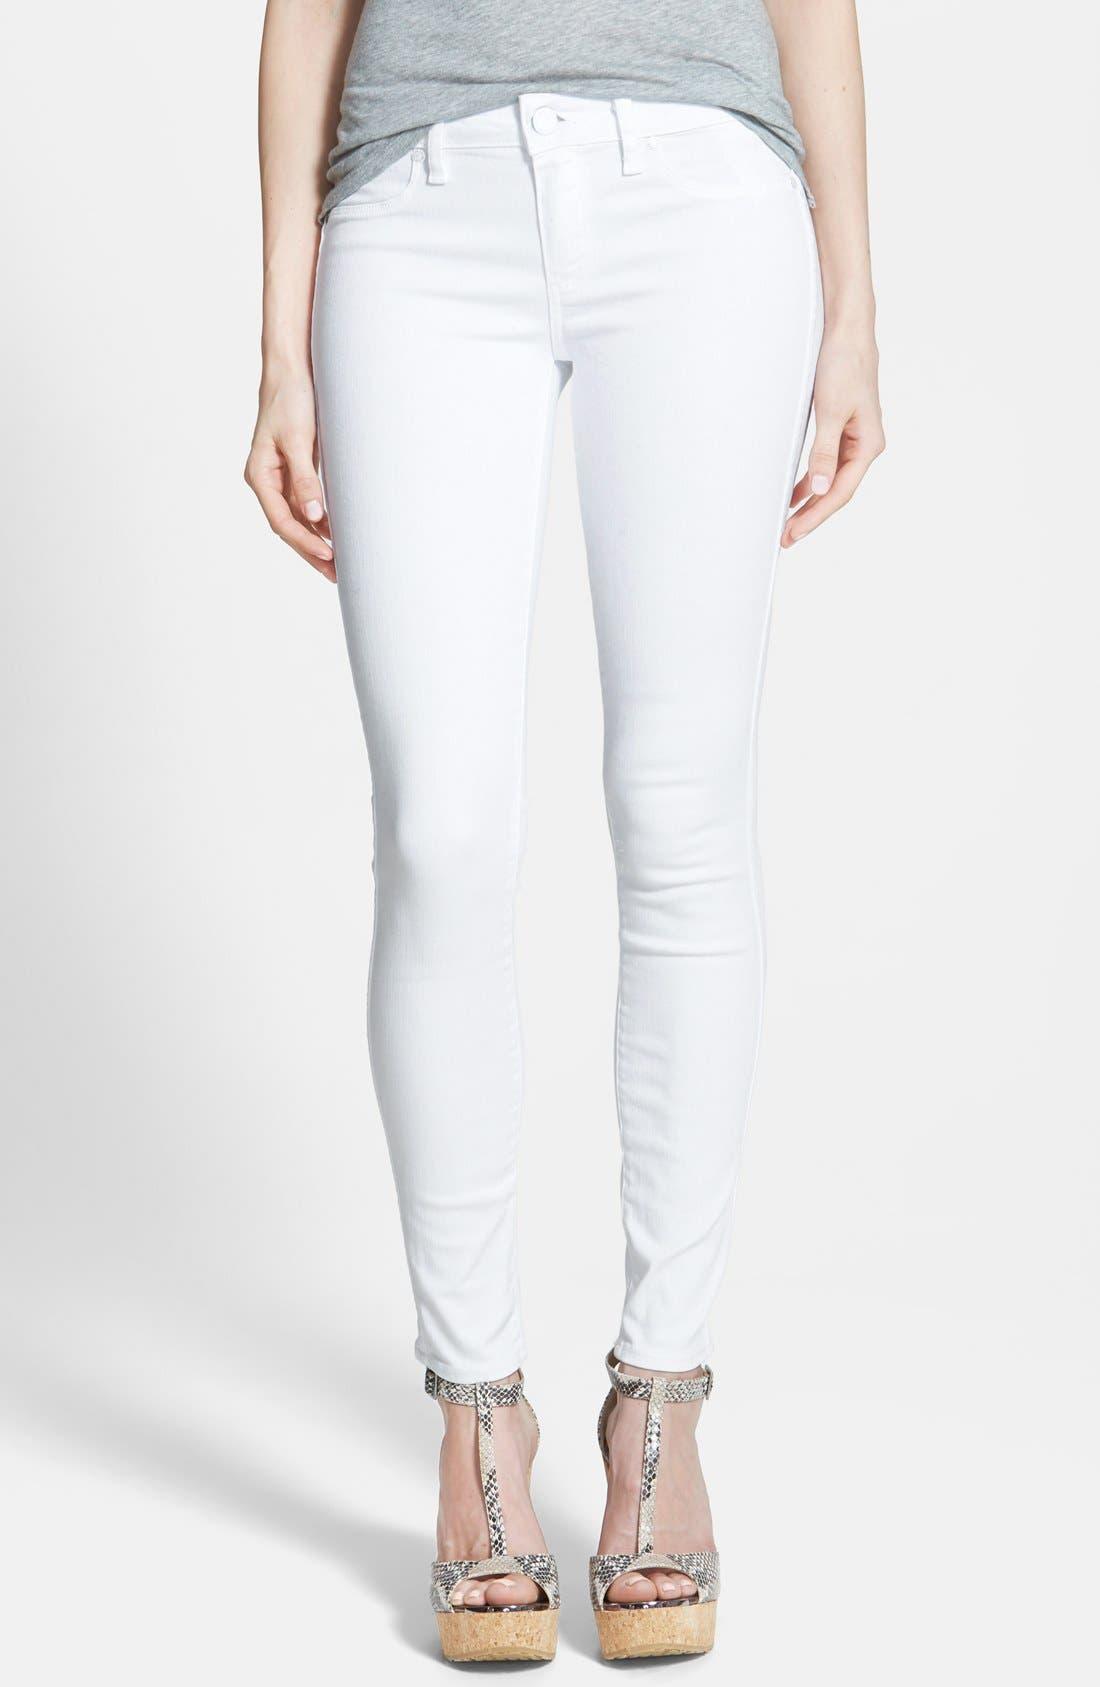 Main Image - PAIGE 'Verdugo' Ultra Skinny Jeans (Ultra White)